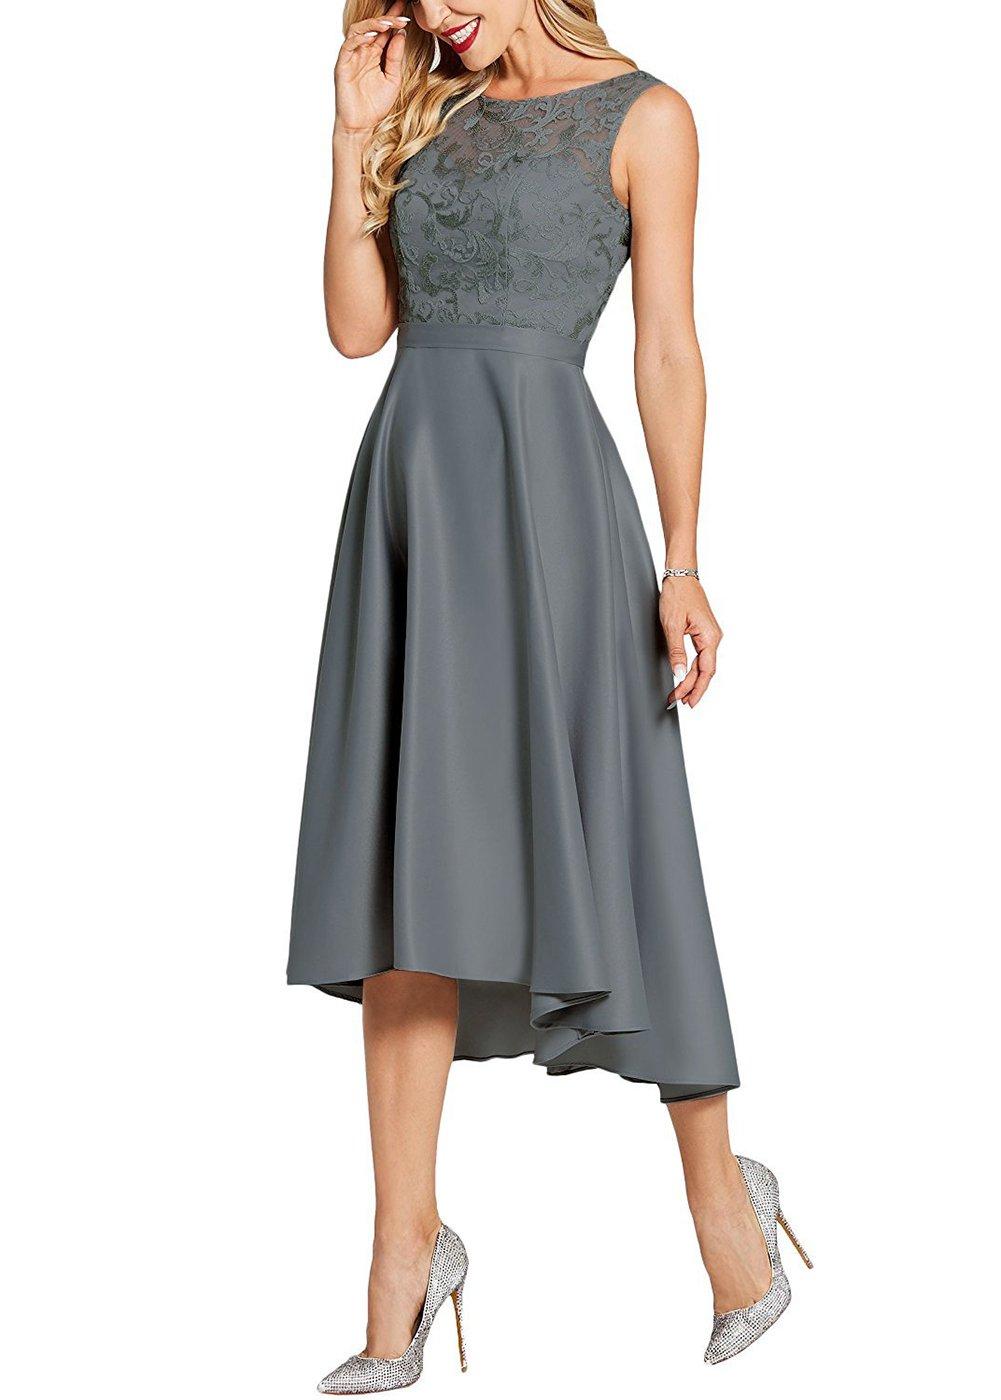 Tea Length Mother Of The Groom Dresses For Summer 64 Off Plykart Com,Famous Carolina Herrera Wedding Dresses